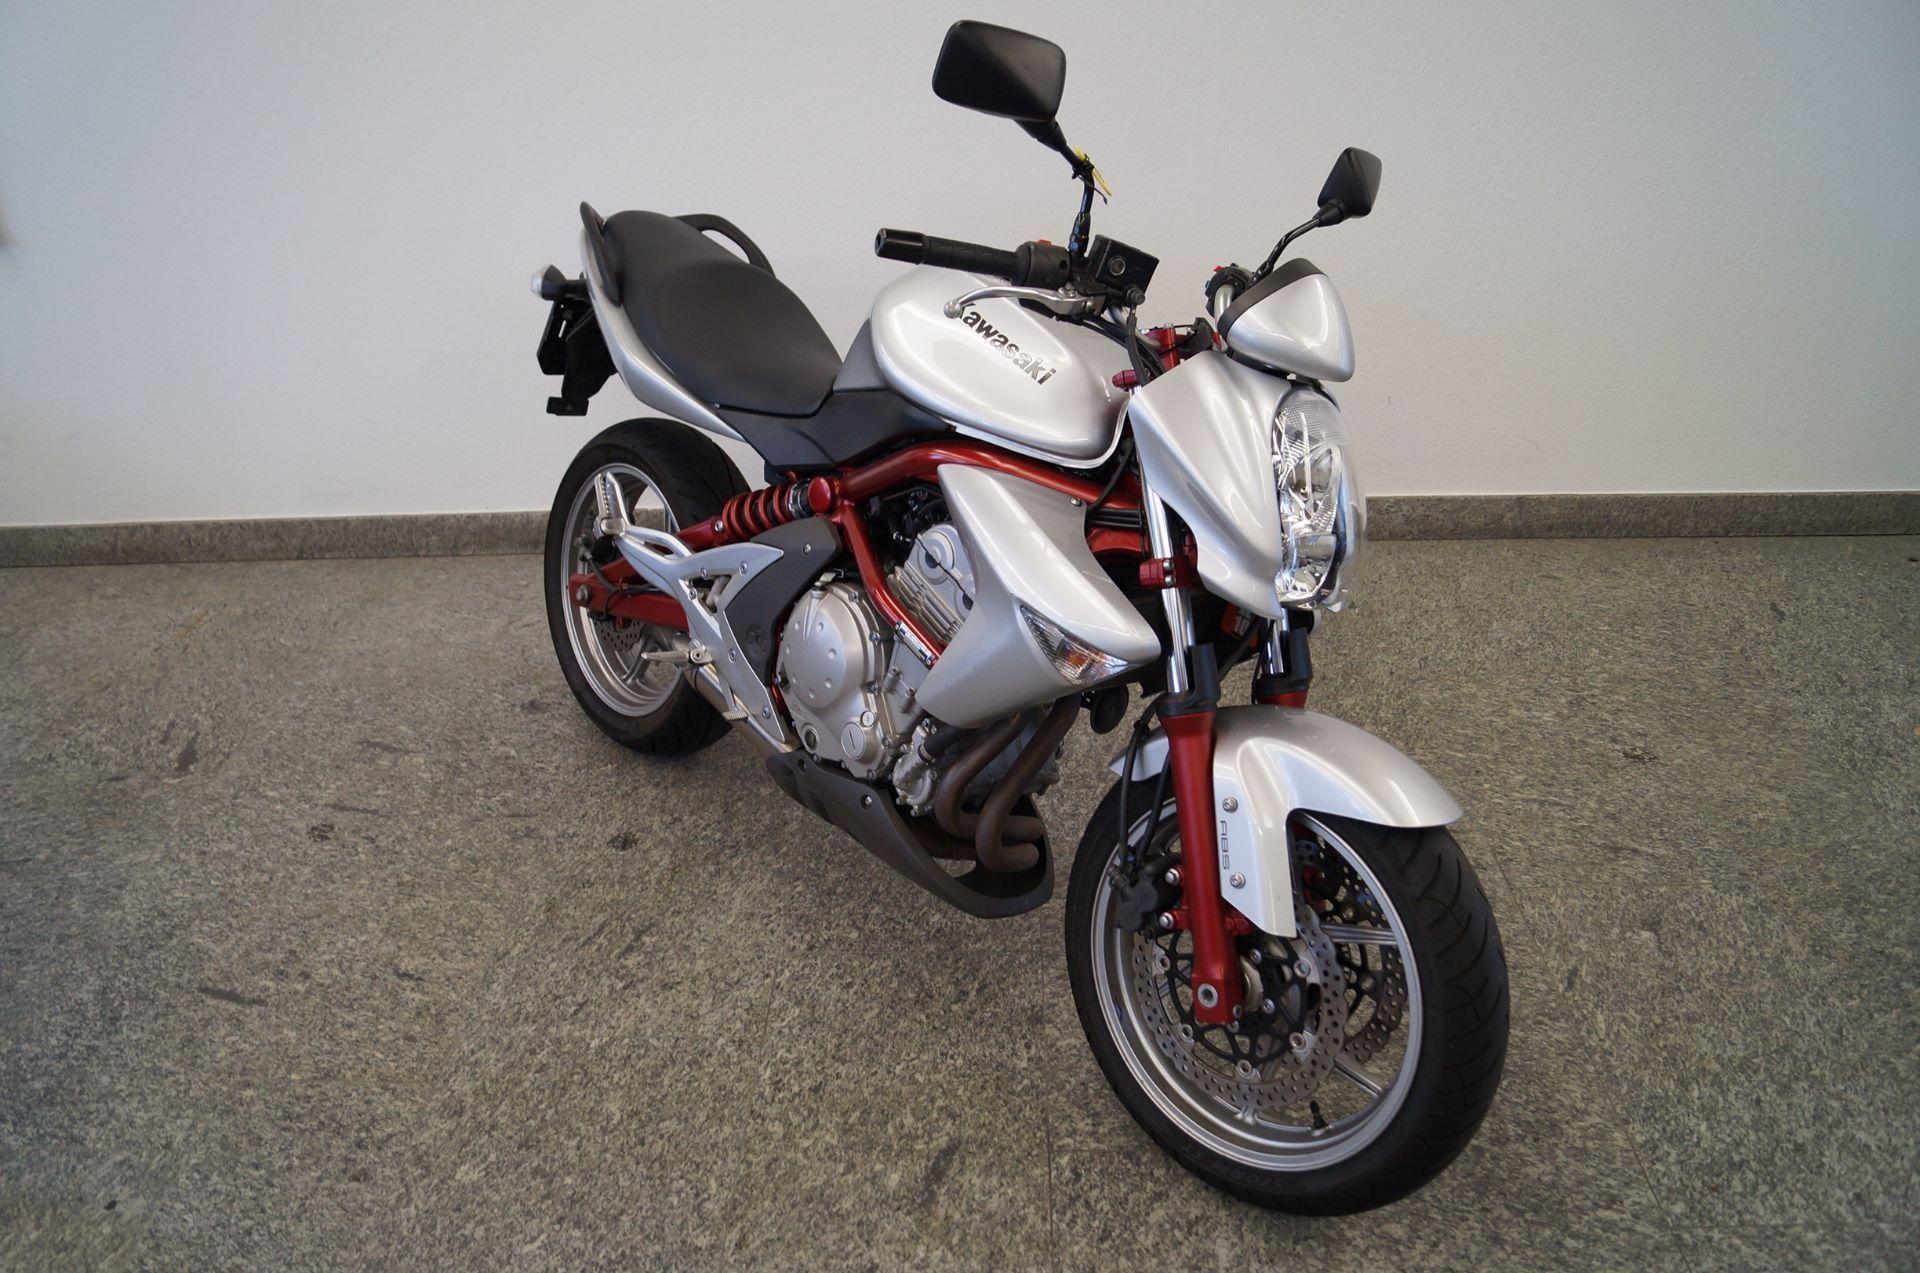 motorrad occasion kaufen kawasaki er 6n abs scherrer motos ag steckborn. Black Bedroom Furniture Sets. Home Design Ideas